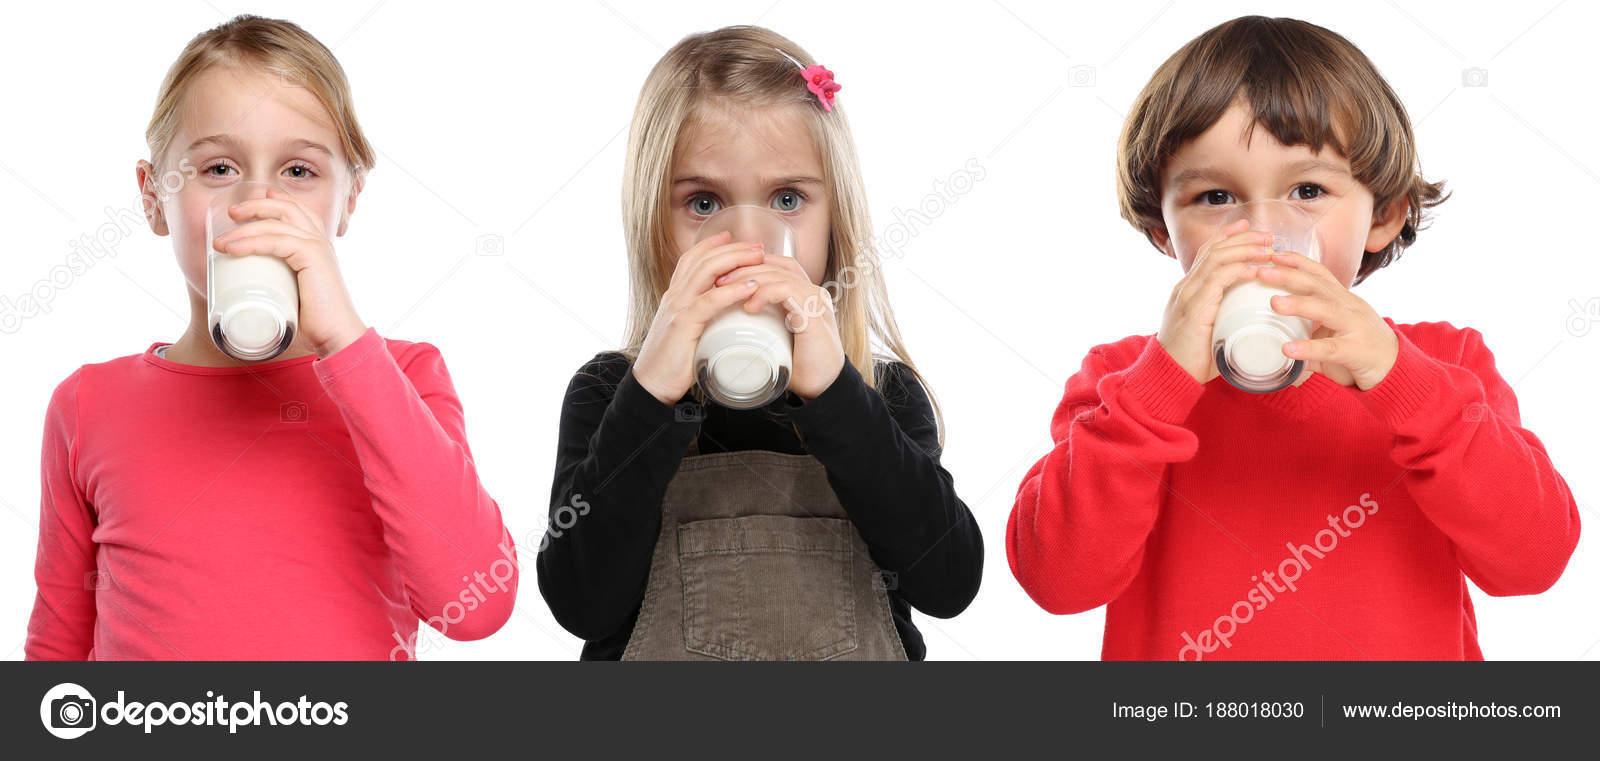 c9454775a28 Τα παιδιά μικρό παιδί αγόρι κορίτσι πίνει γάλα παιδί ποτήρι υγιή e ...